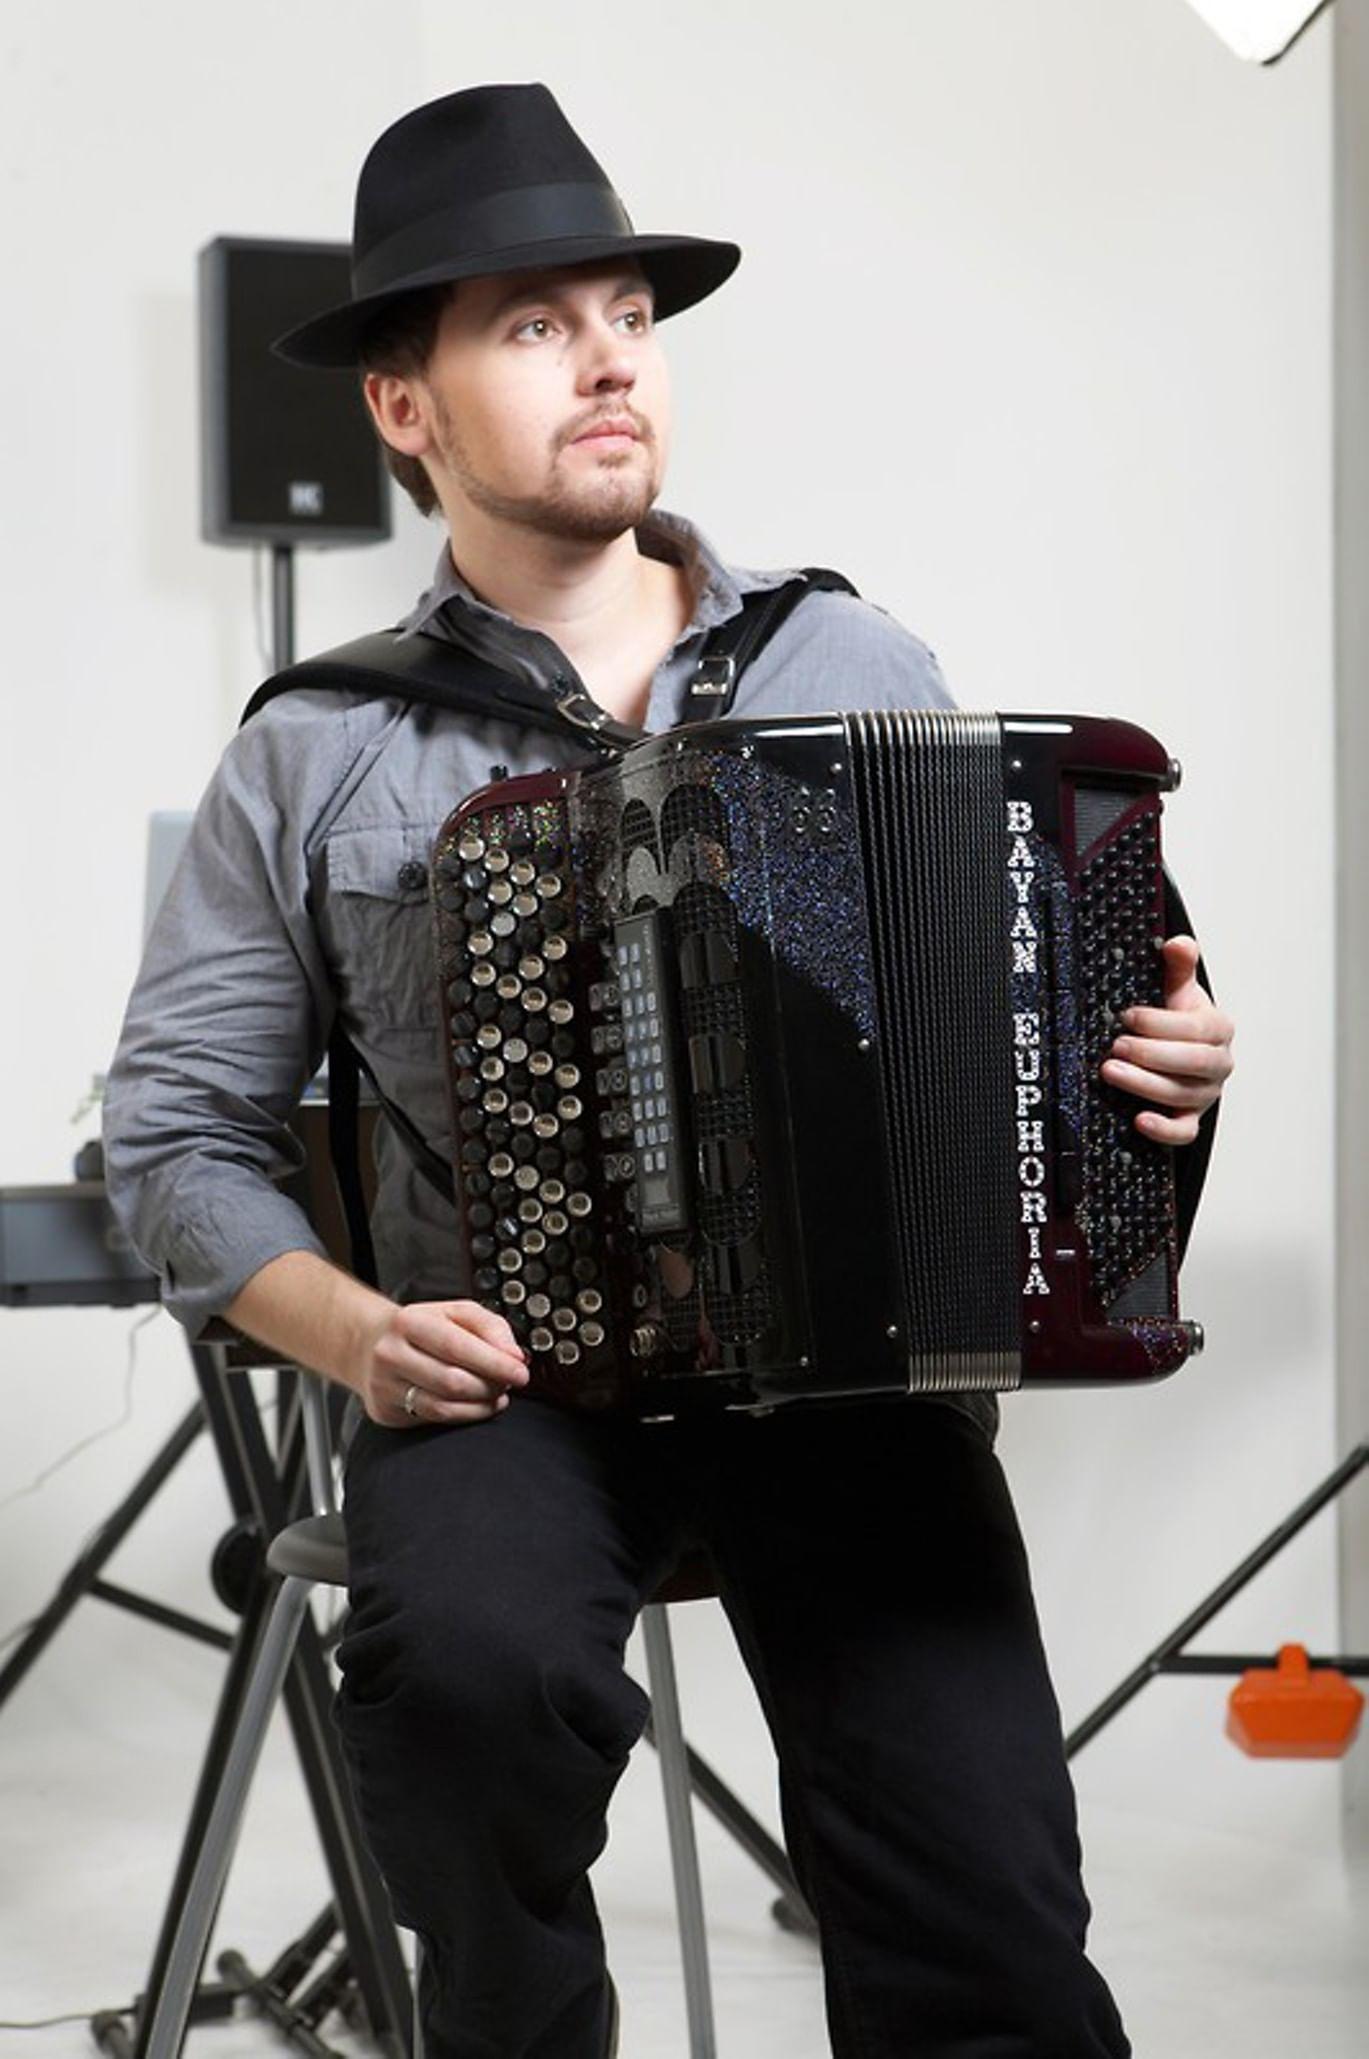 Айдар Гайнуллин: Моя музыка имеет свое лицо. Галерея 2